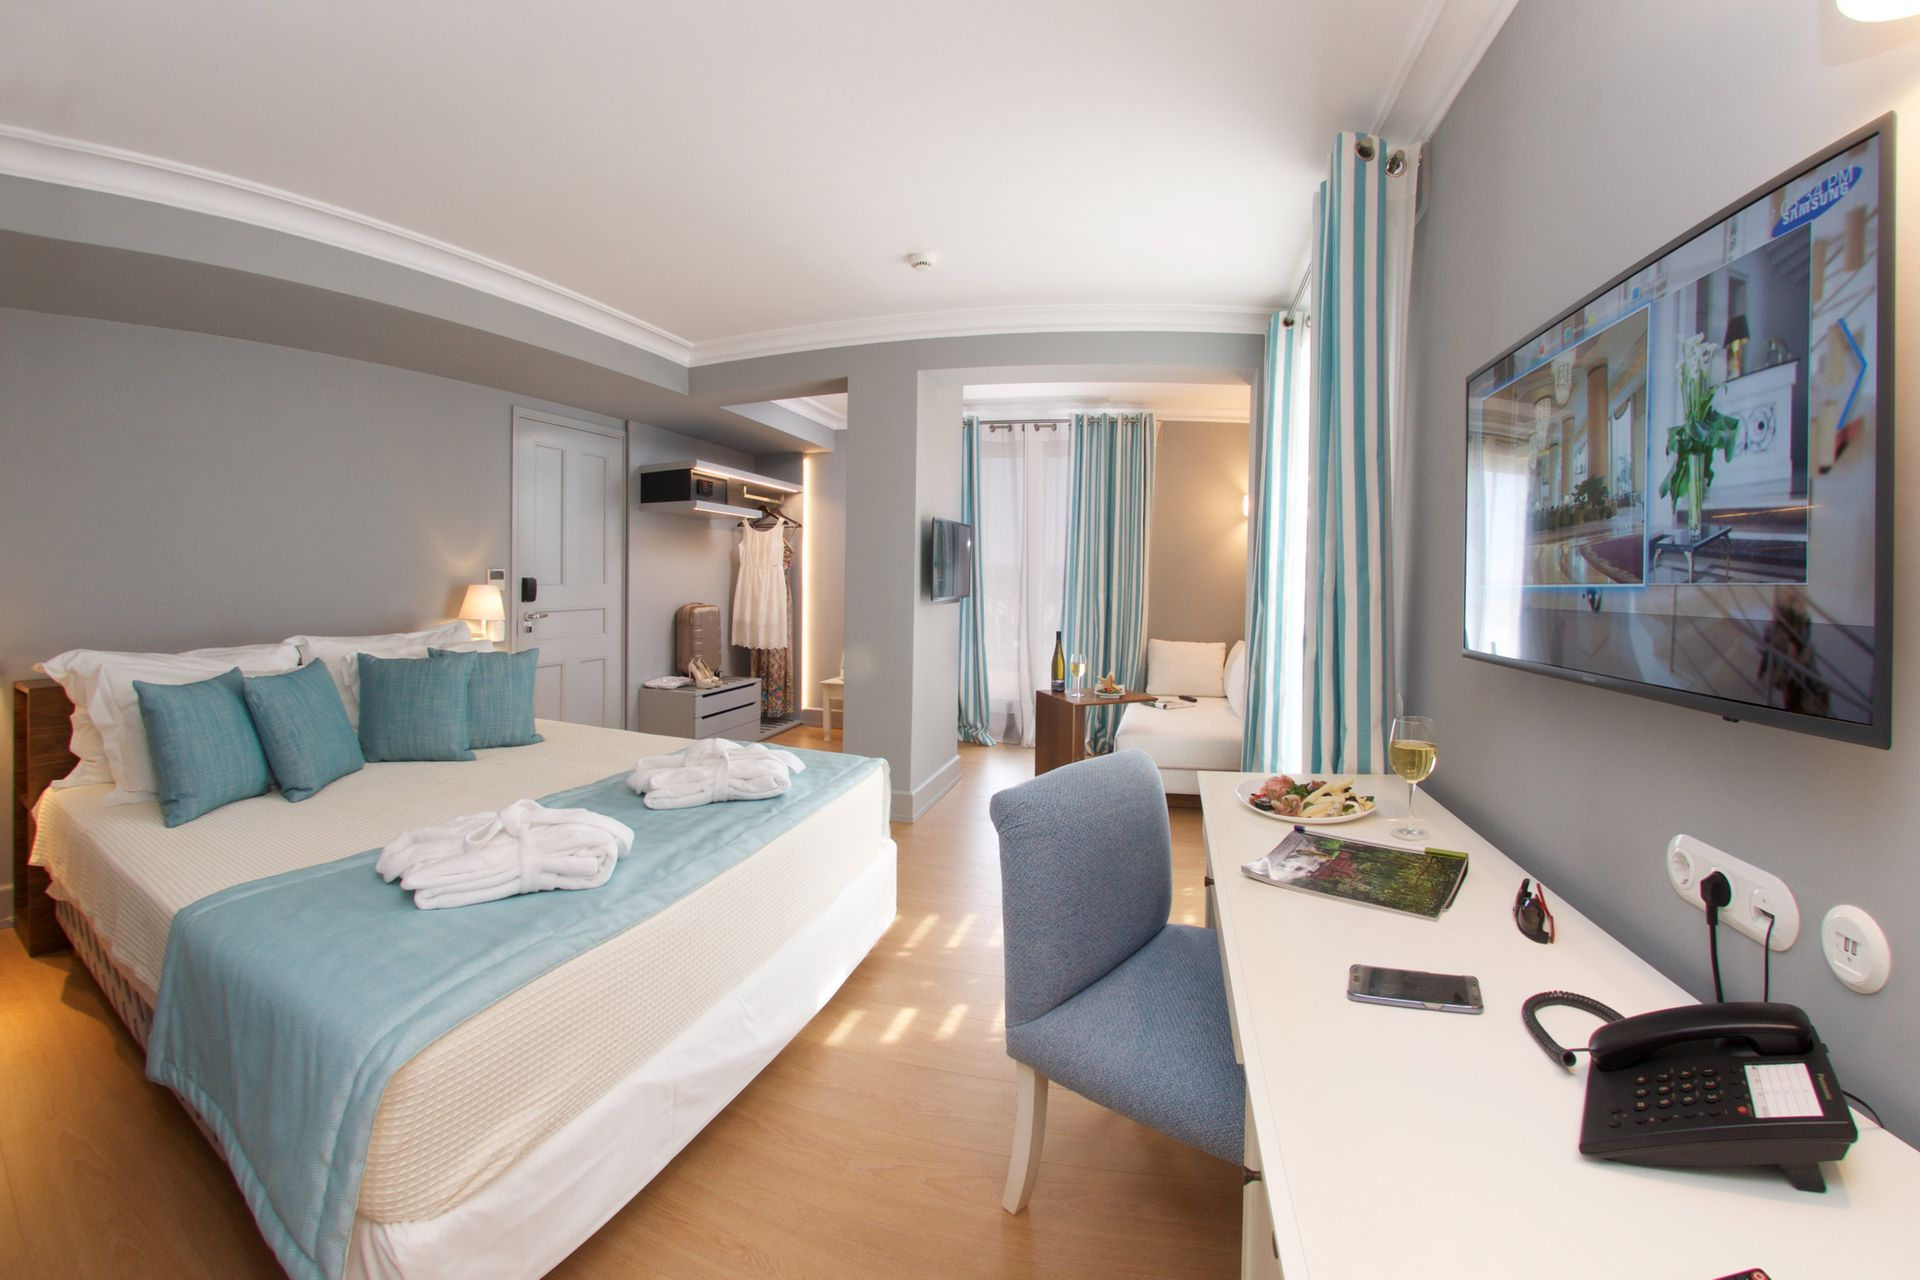 4* Aenos Hotel - Κεφαλονιά ✦ -41% ✦ 2 Ημέρες (1 Διανυκτέρευση) ✦ 2 άτομα ✦ Πρωινό ✦ 01/07/2021 έως 31/08/2021 ✦ Μοναδική Τοποθεσία!